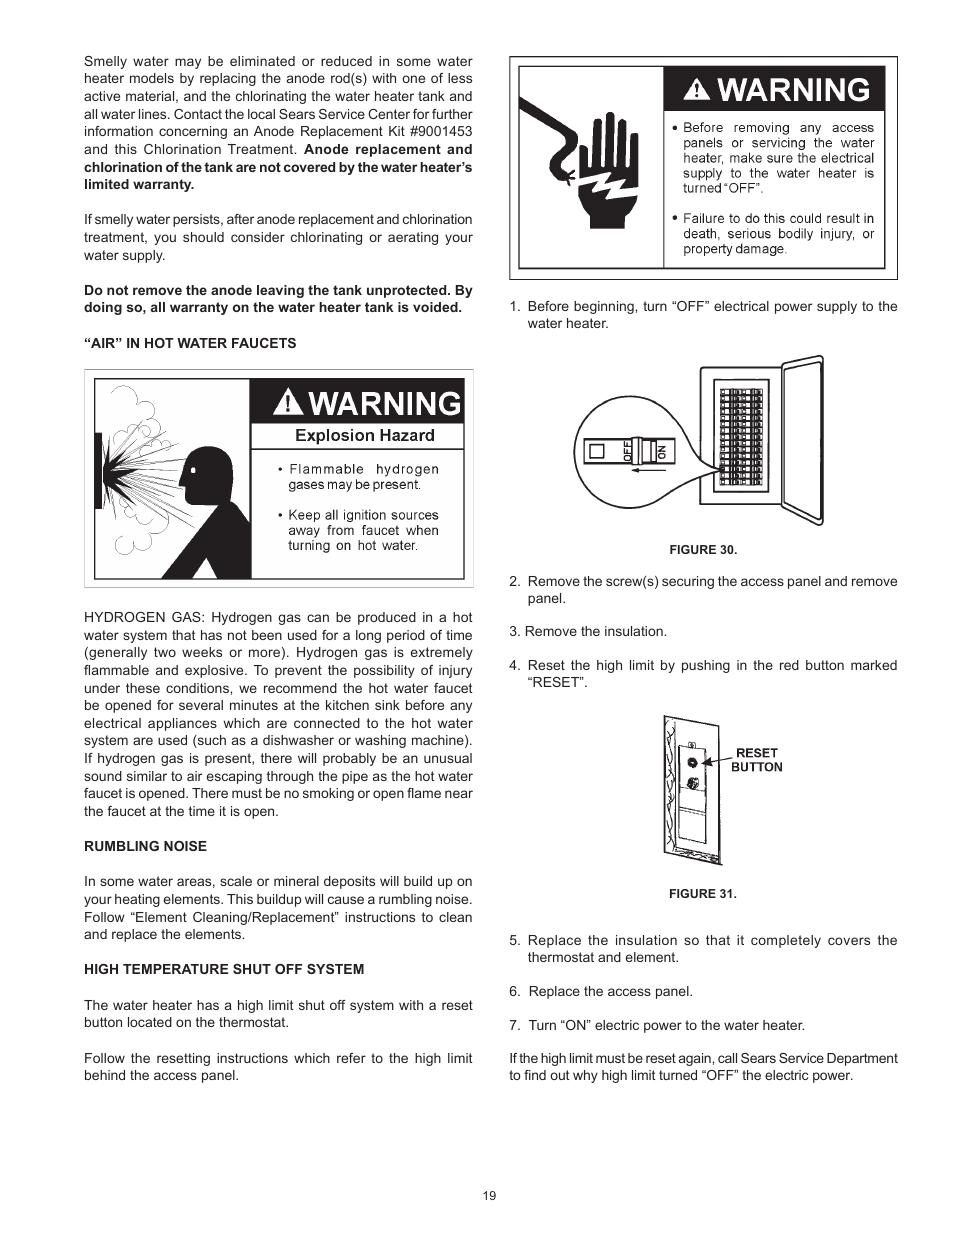 Kenmore Economizer 5 Gas Water Heater Manual Nemetasaufgegabelt Electric Wiring Diagram The Economizertm 6 Compact 15331604 User Page 19